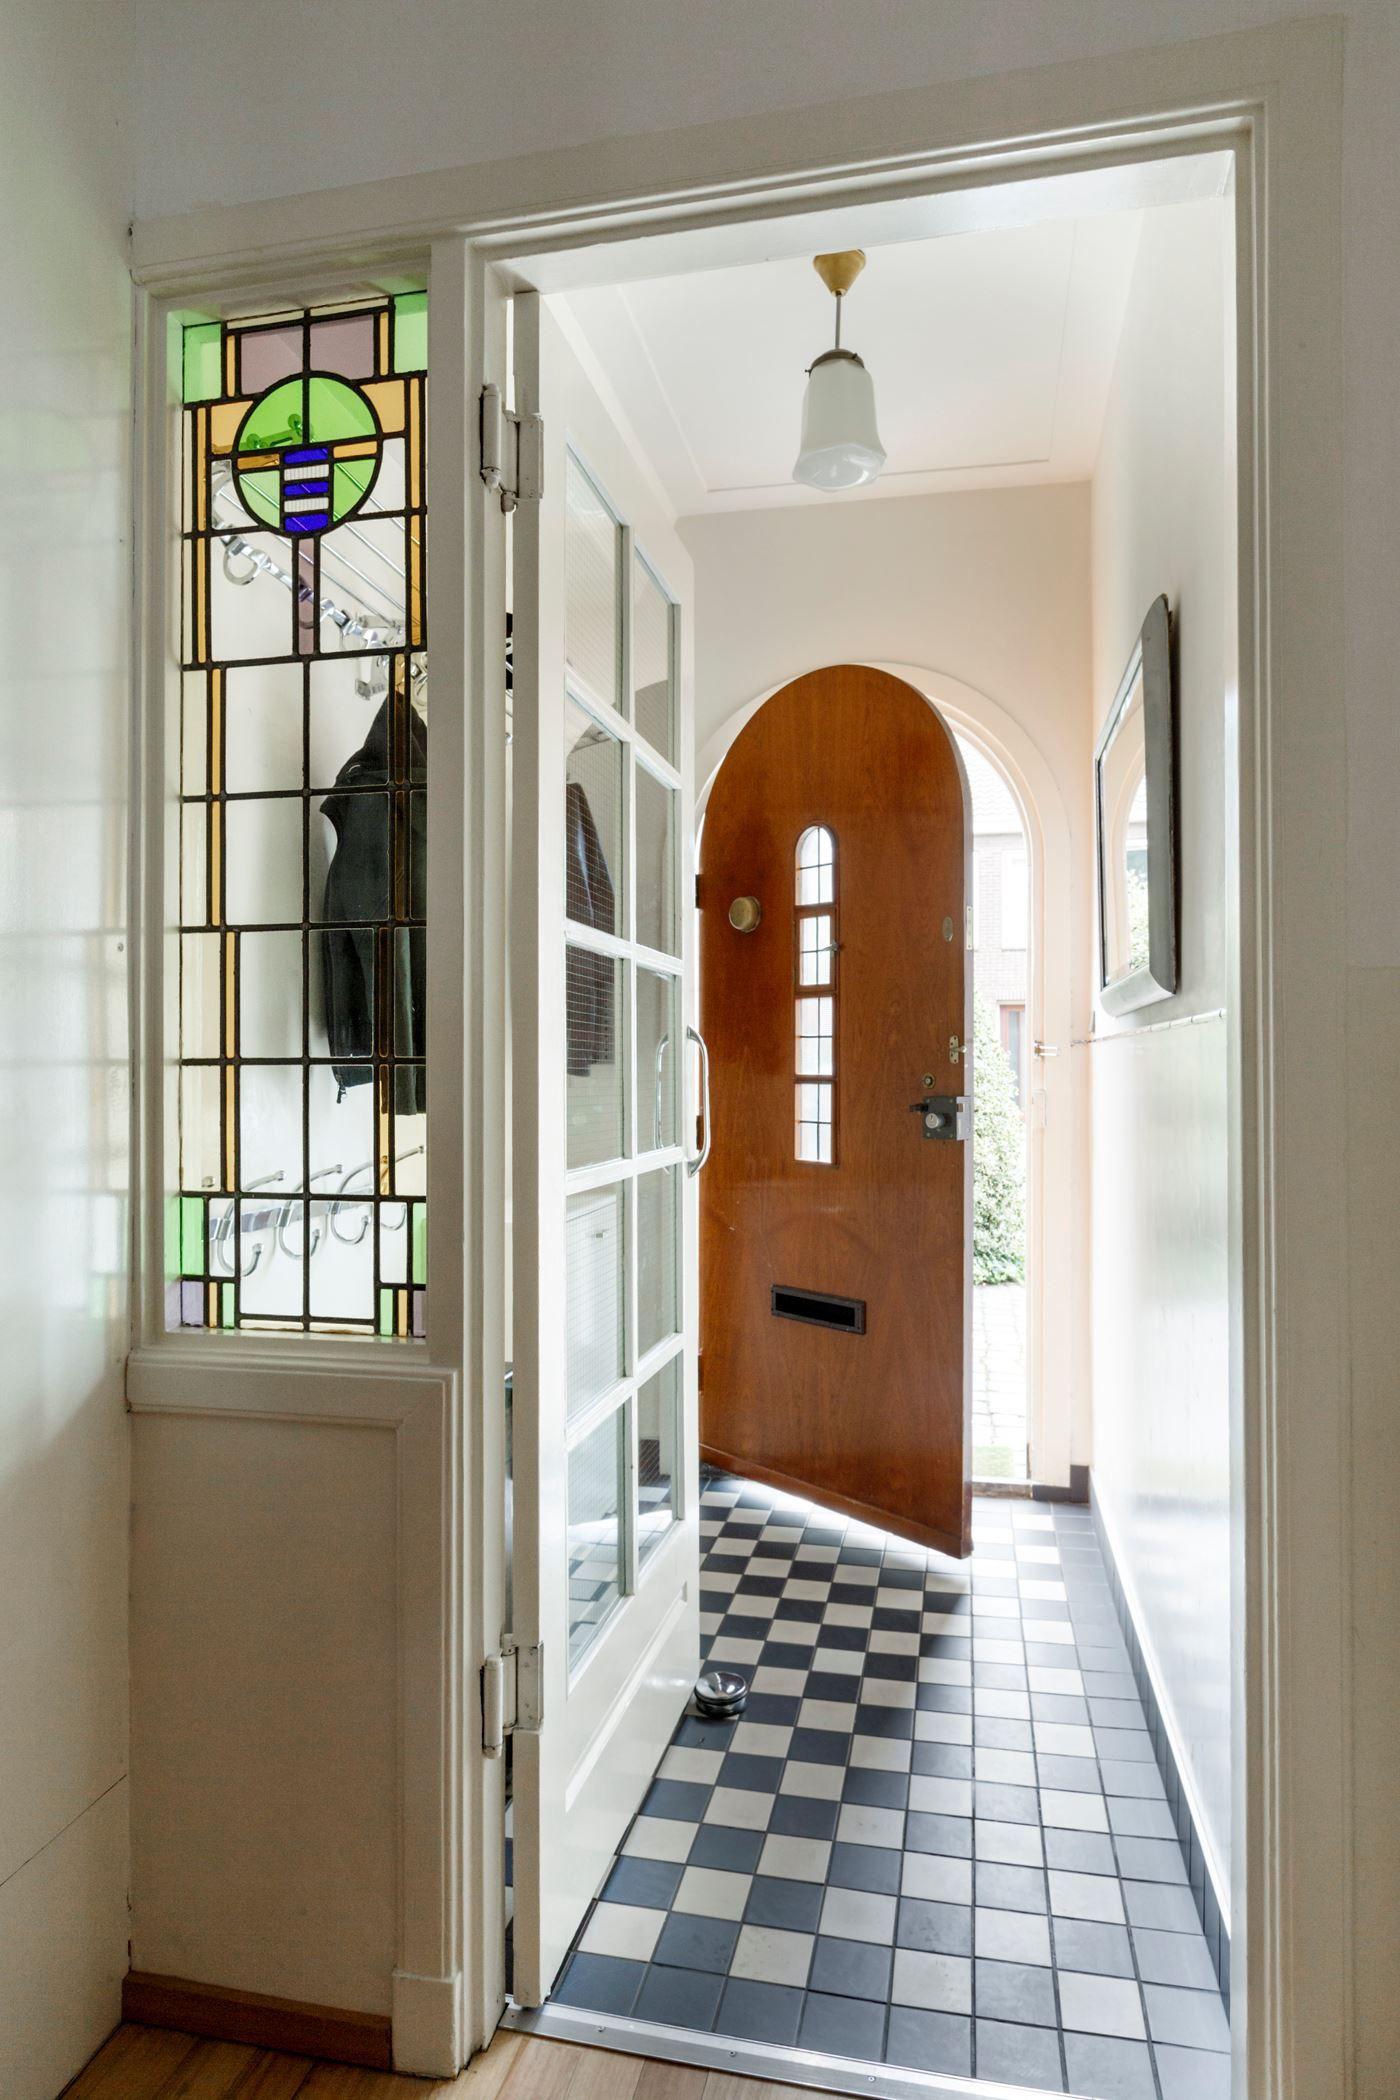 Mooie vestibule met authentieke for Interieur ideeen gang